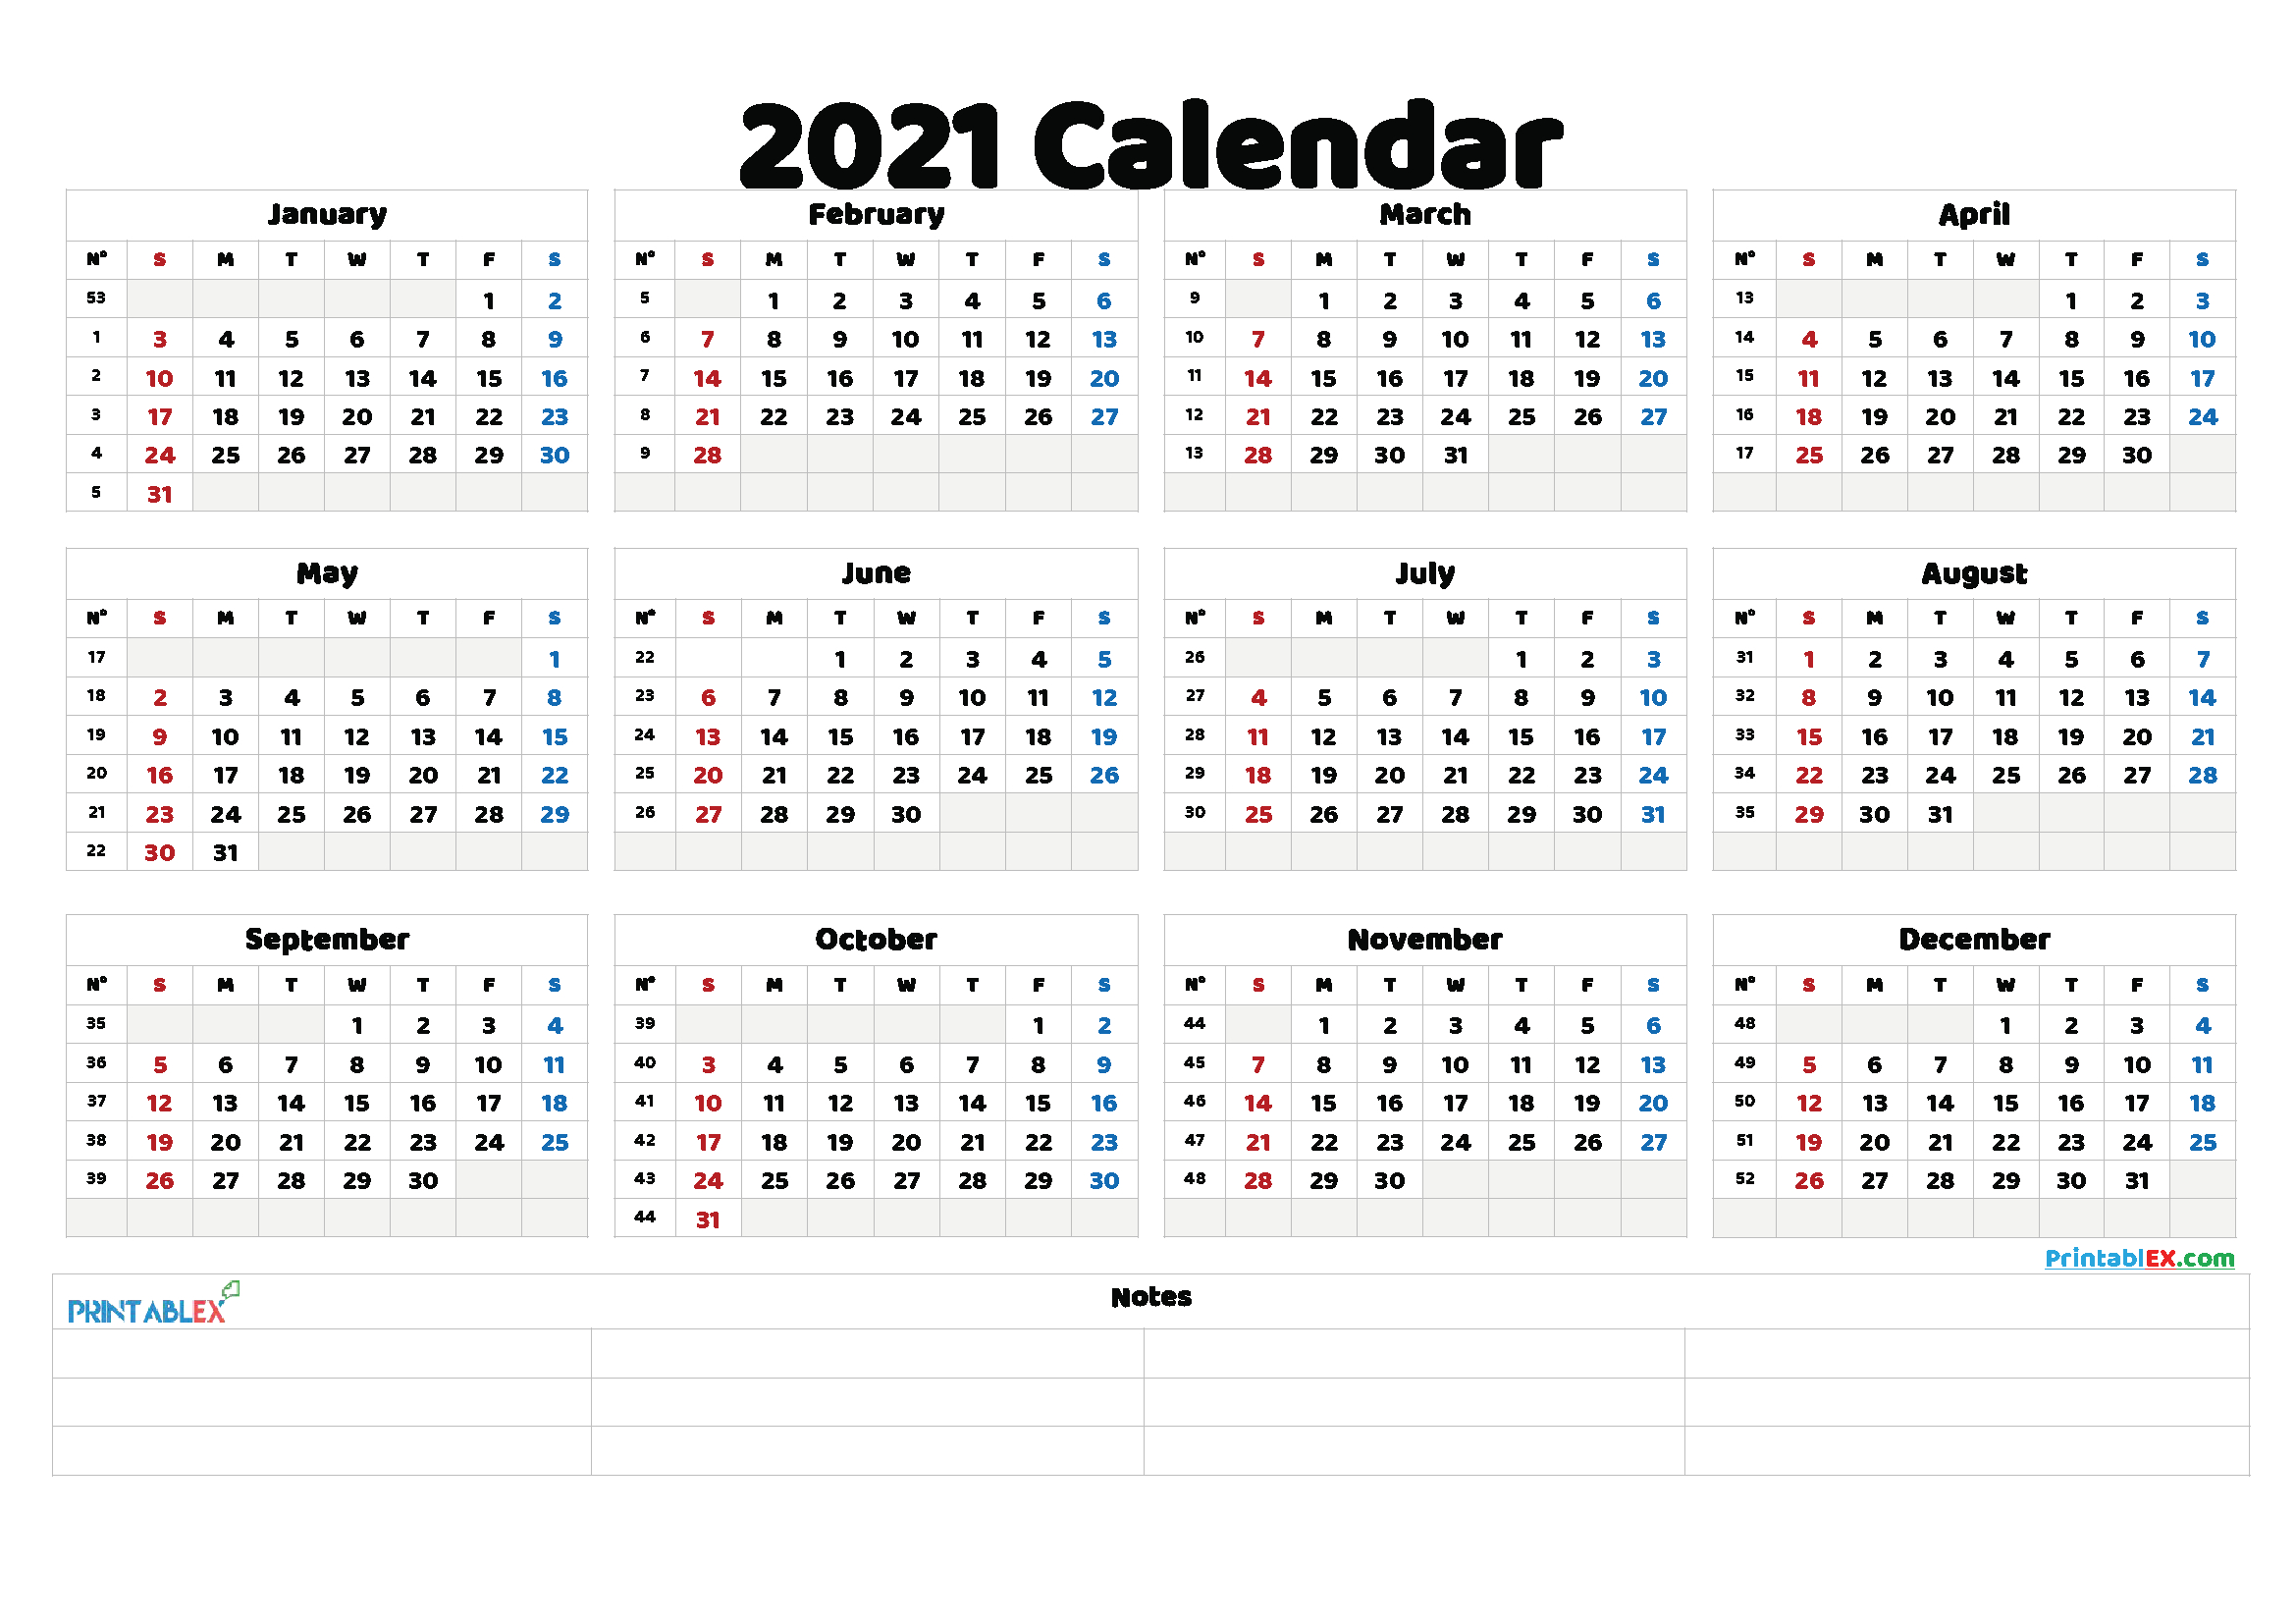 Free Printable 2021 Yearly Calendar – 21Ytw137 | Printable